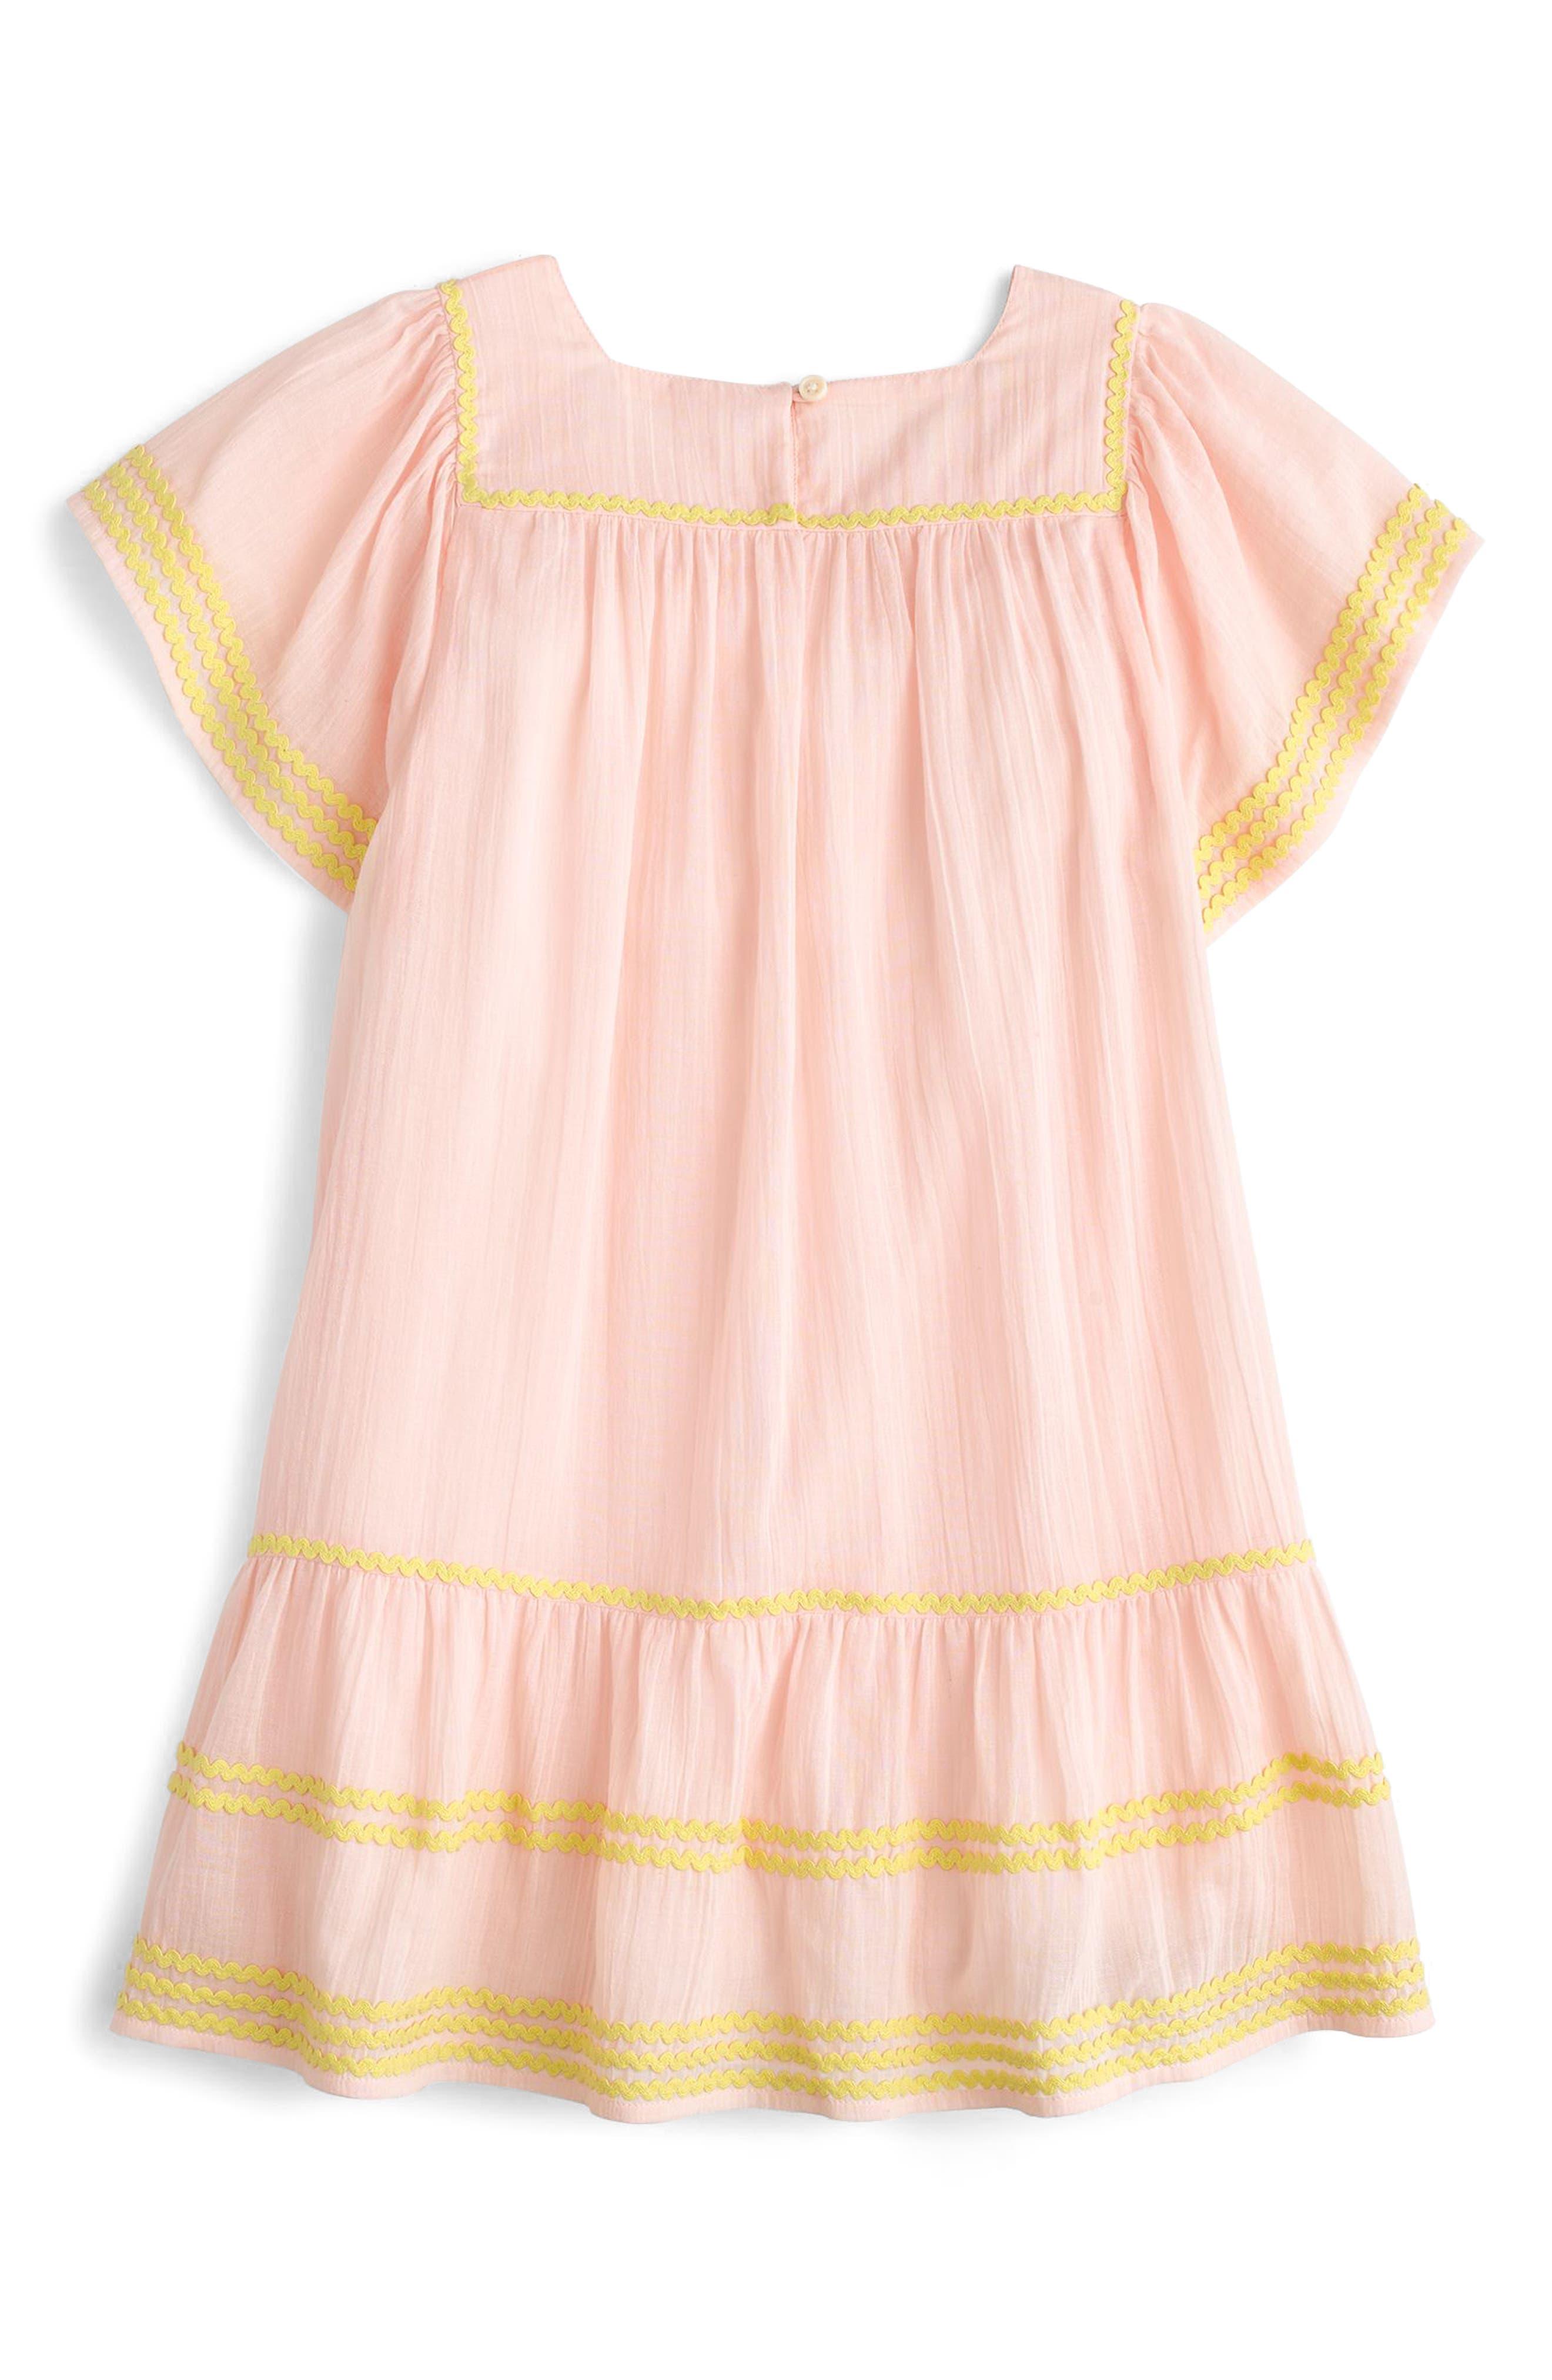 Bardot Cotton Dress,                             Alternate thumbnail 2, color,                             Sunwashed Pink